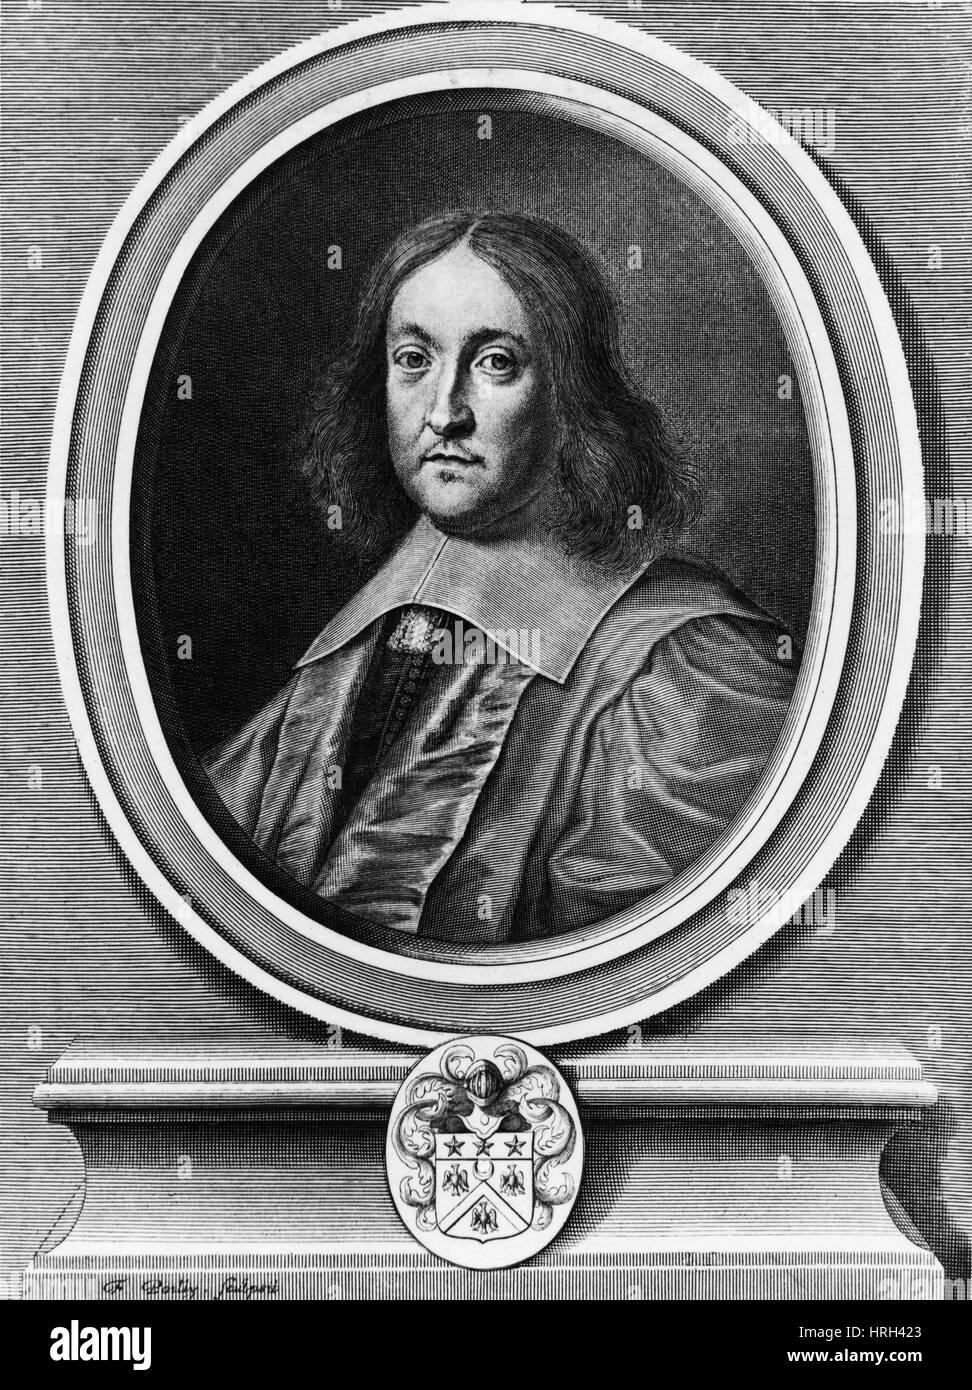 Pierre de Fermat, French Mathematician - Stock Image